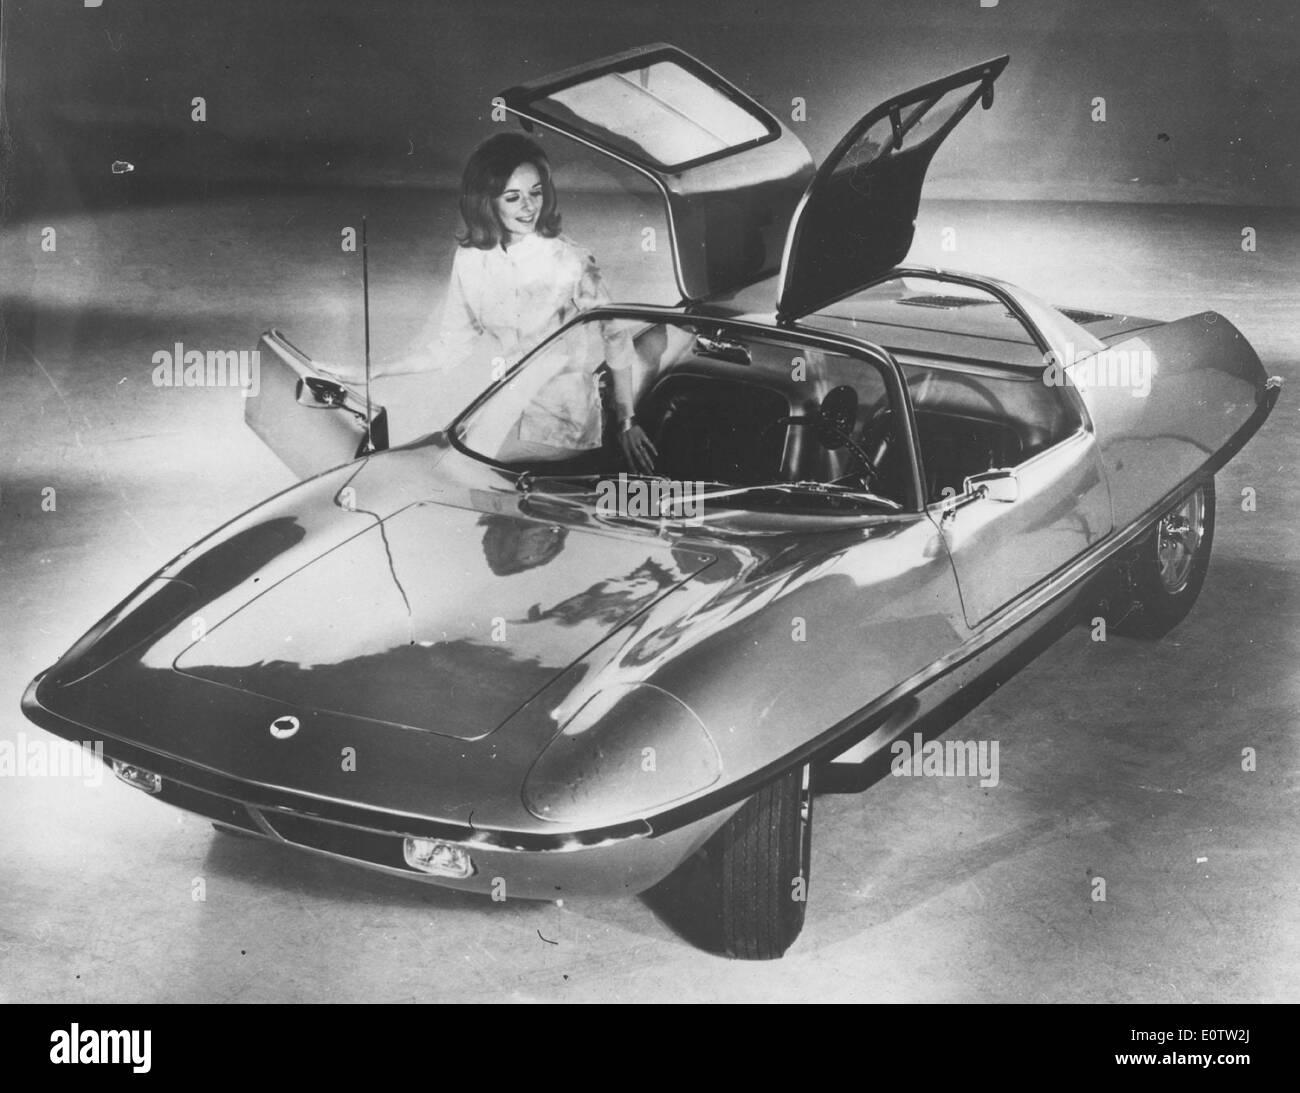 1960 Centaur Piranha CRV-II Sports car - Stock Image